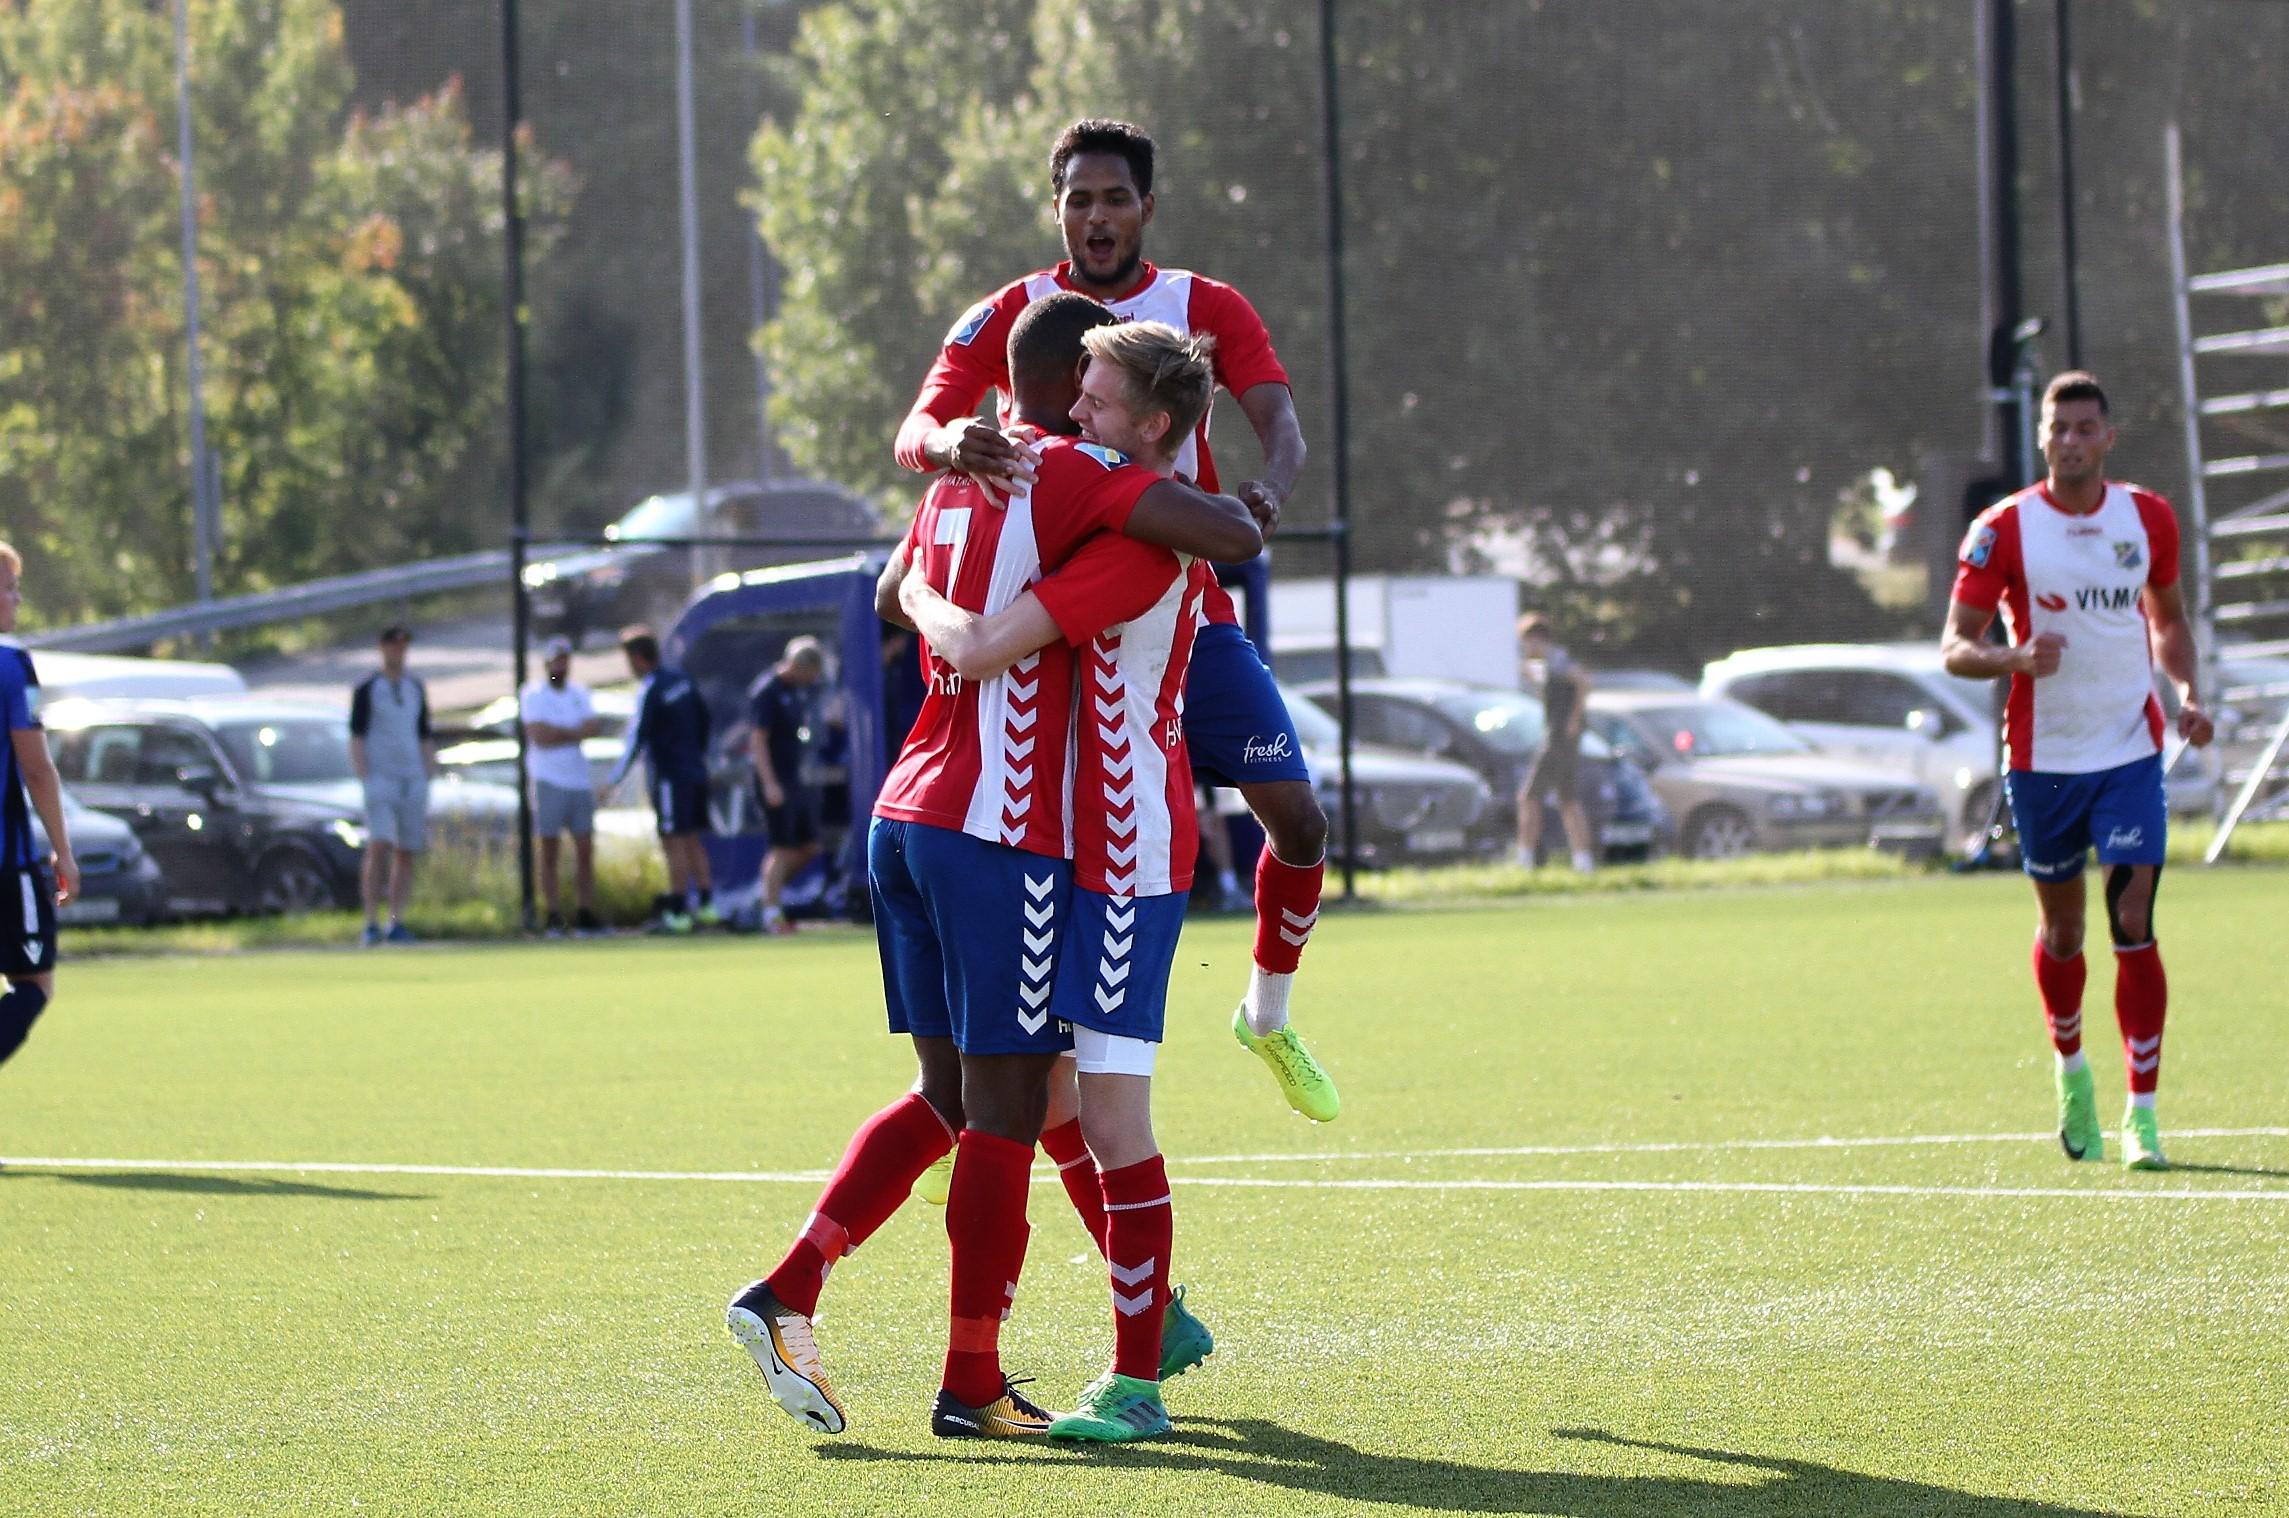 Markus Cham scoret kampens eneste mål på straffe